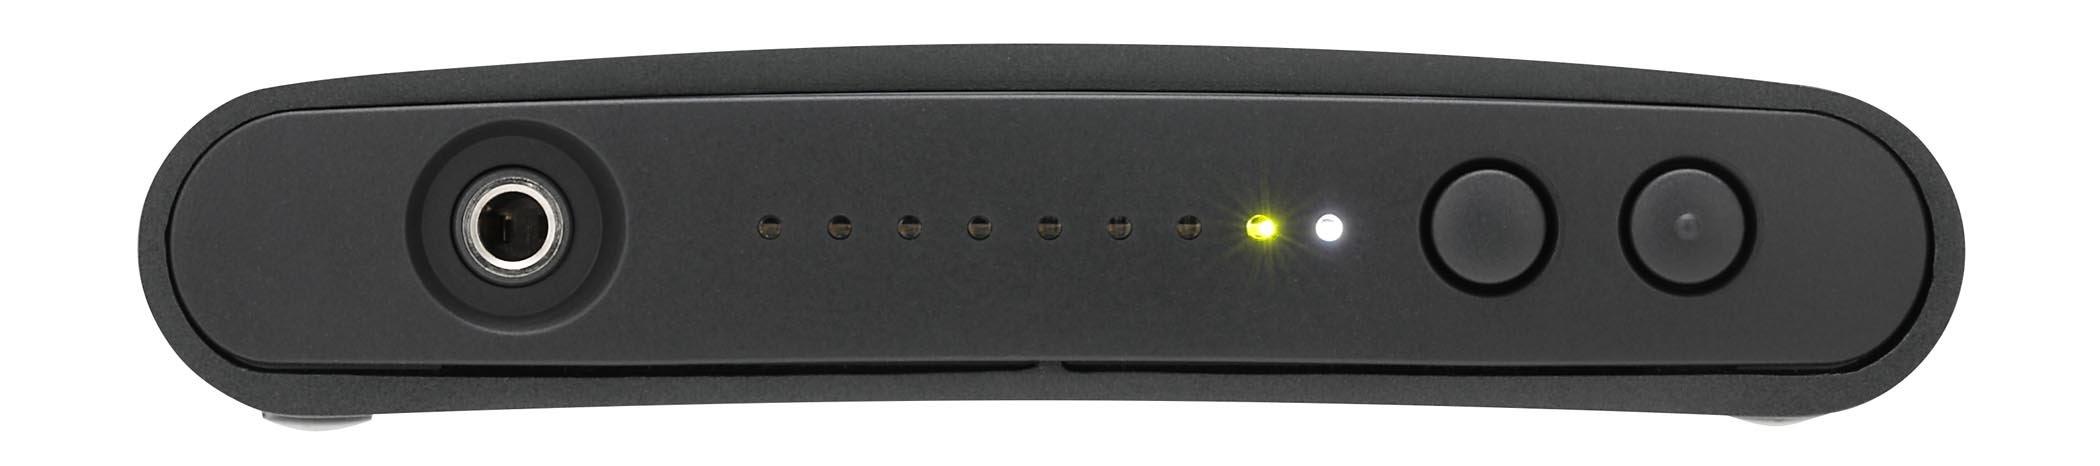 Korg U.S.A. DSDAC100M Digital to Analog Converter by Korg